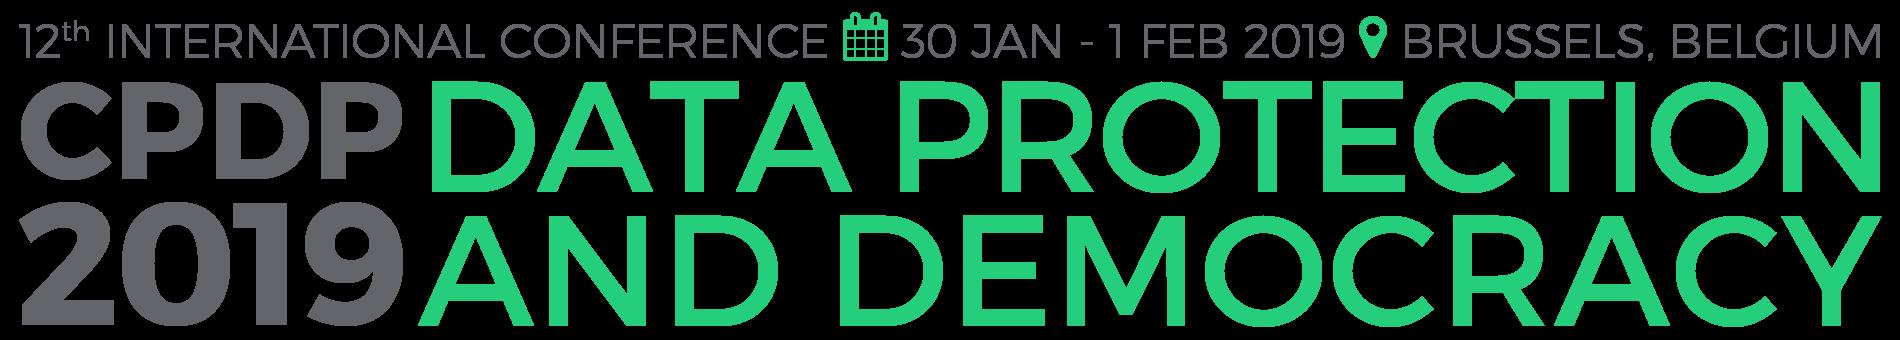 Logo CPDP2019